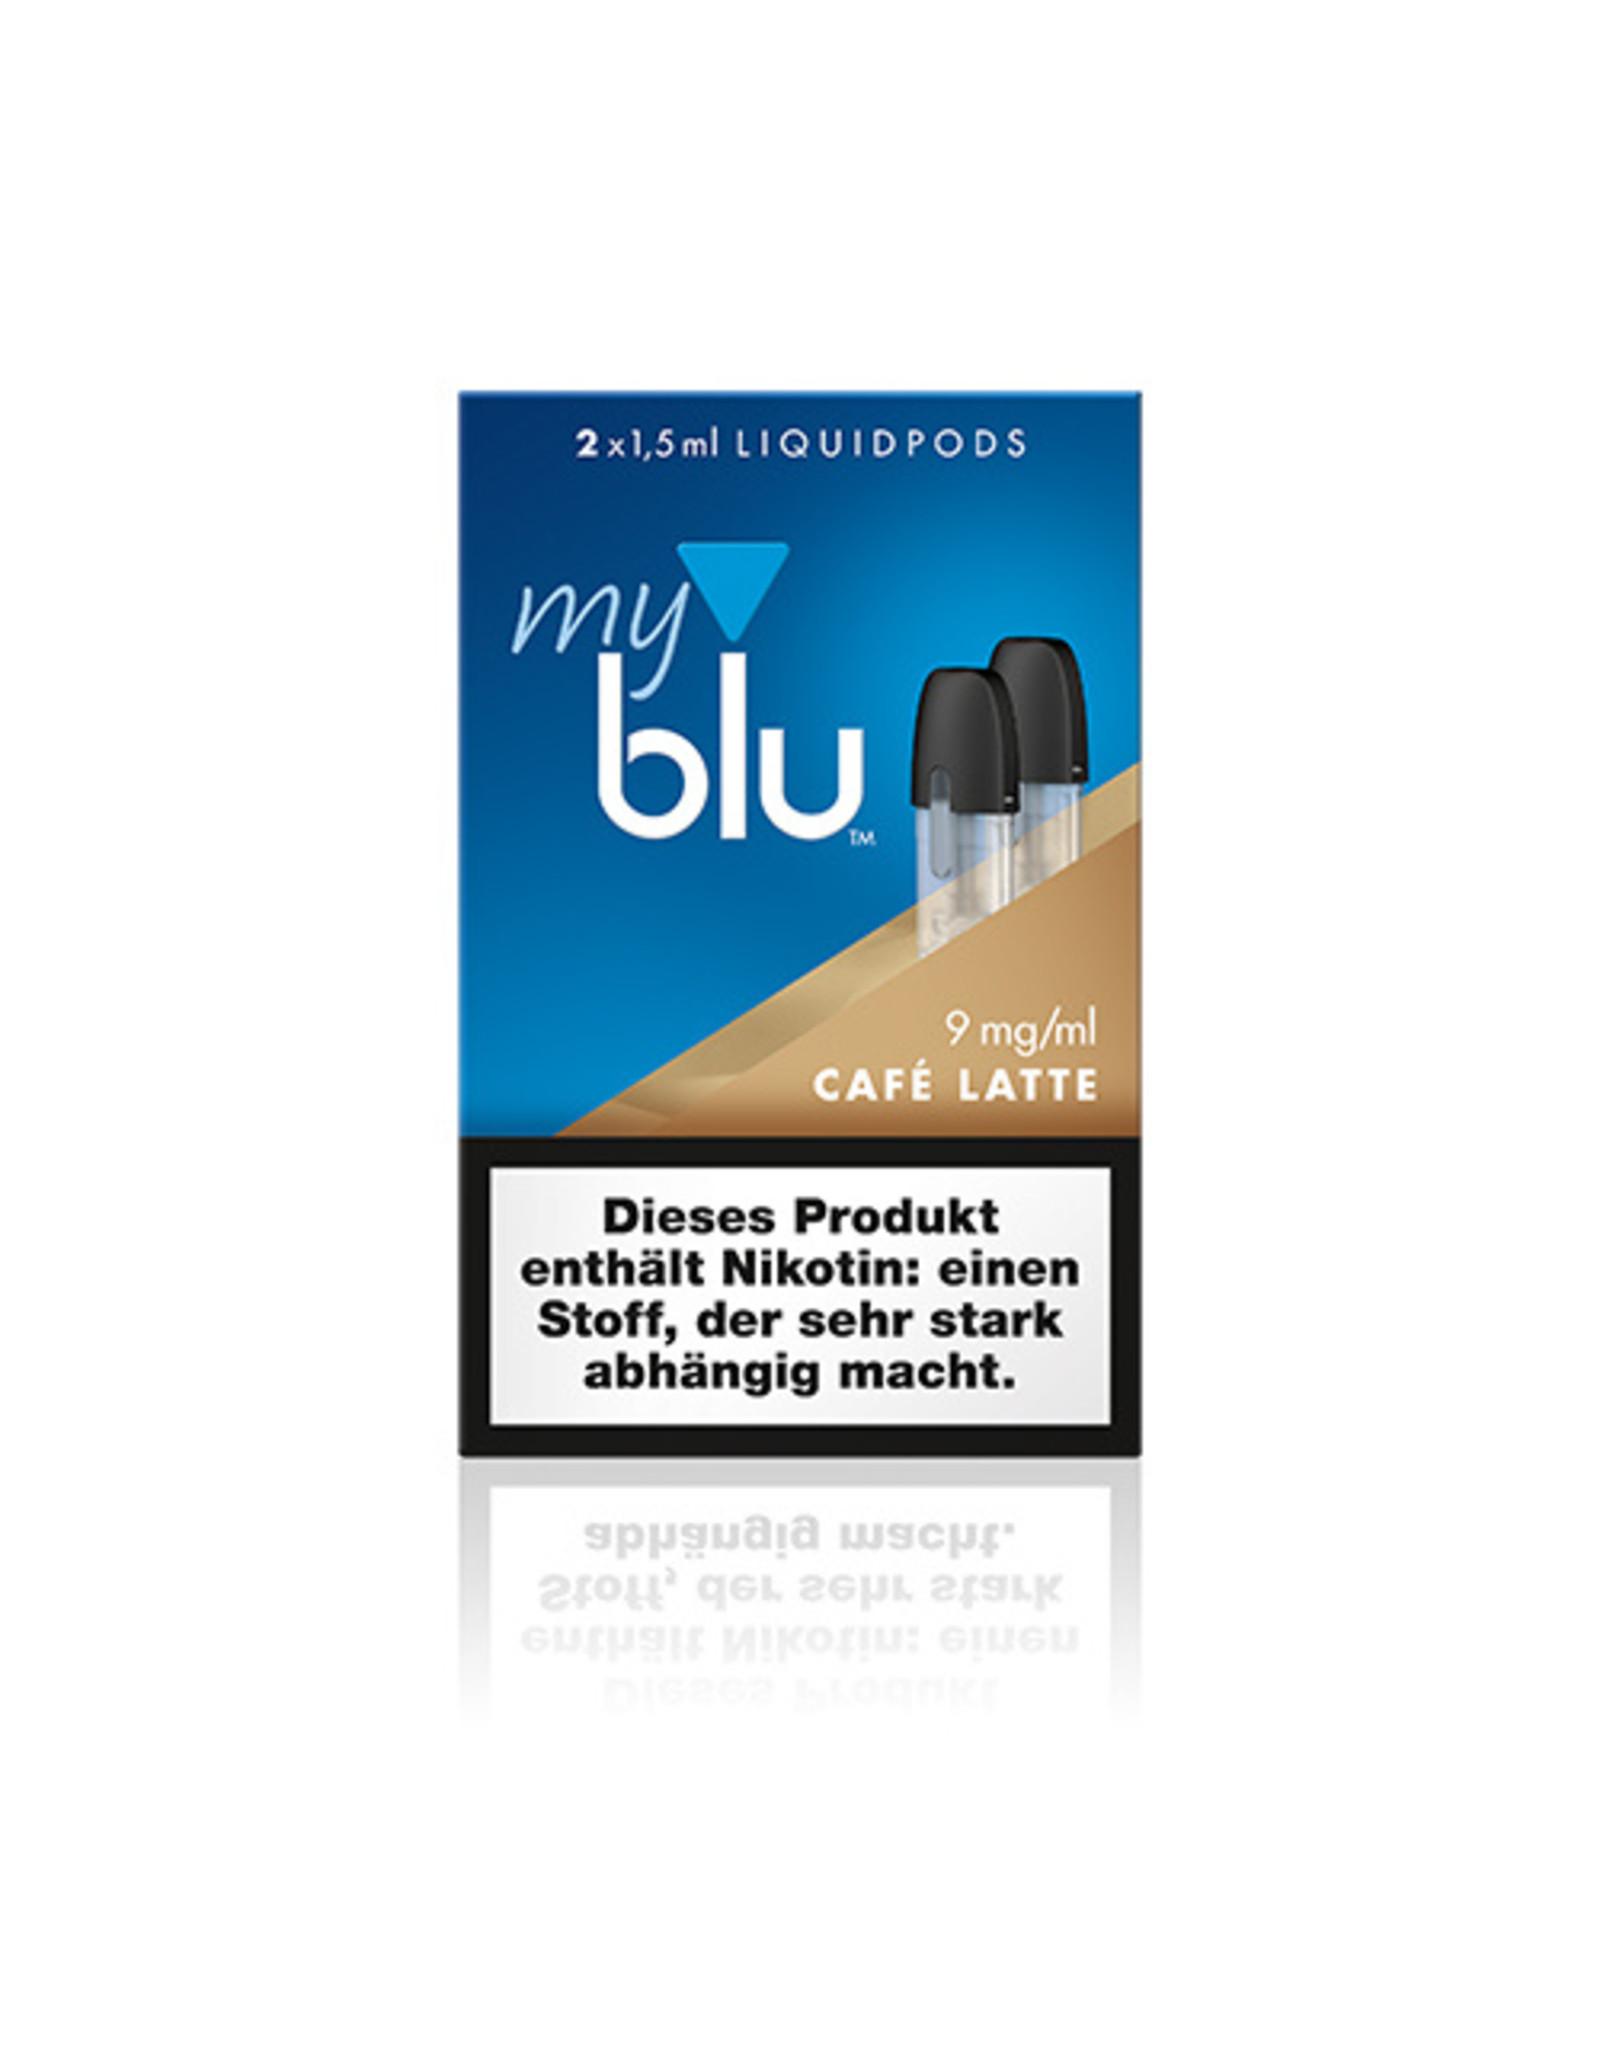 My Blu myblu CAFE LATTE 9mg/ml LIQUIDPOD